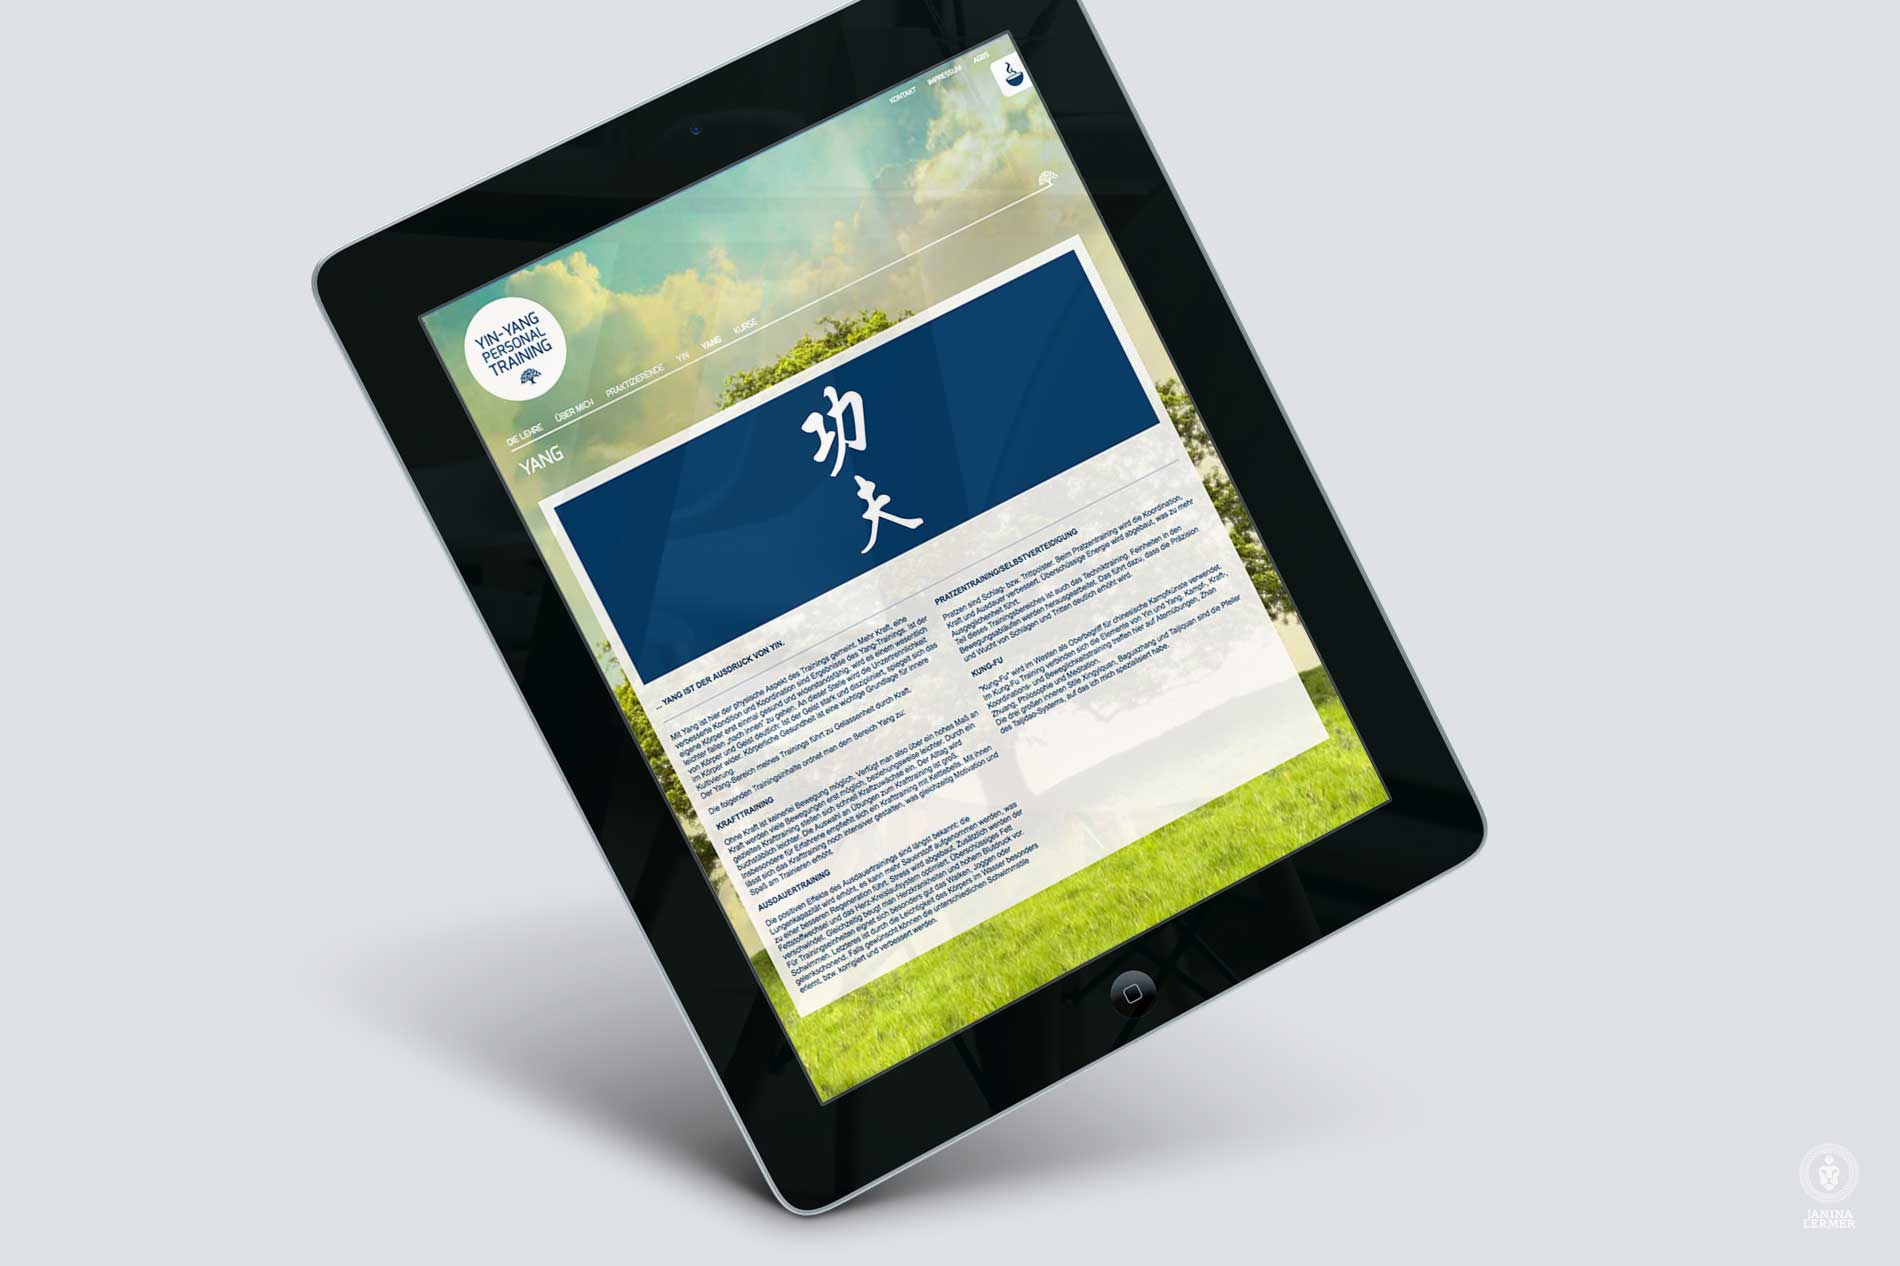 Webseitenkonzept-Webseitengestaltung-Webdesign-Yin-Yang-PersonalTrainer-Ulrich-Lampert-Ipad-YANG